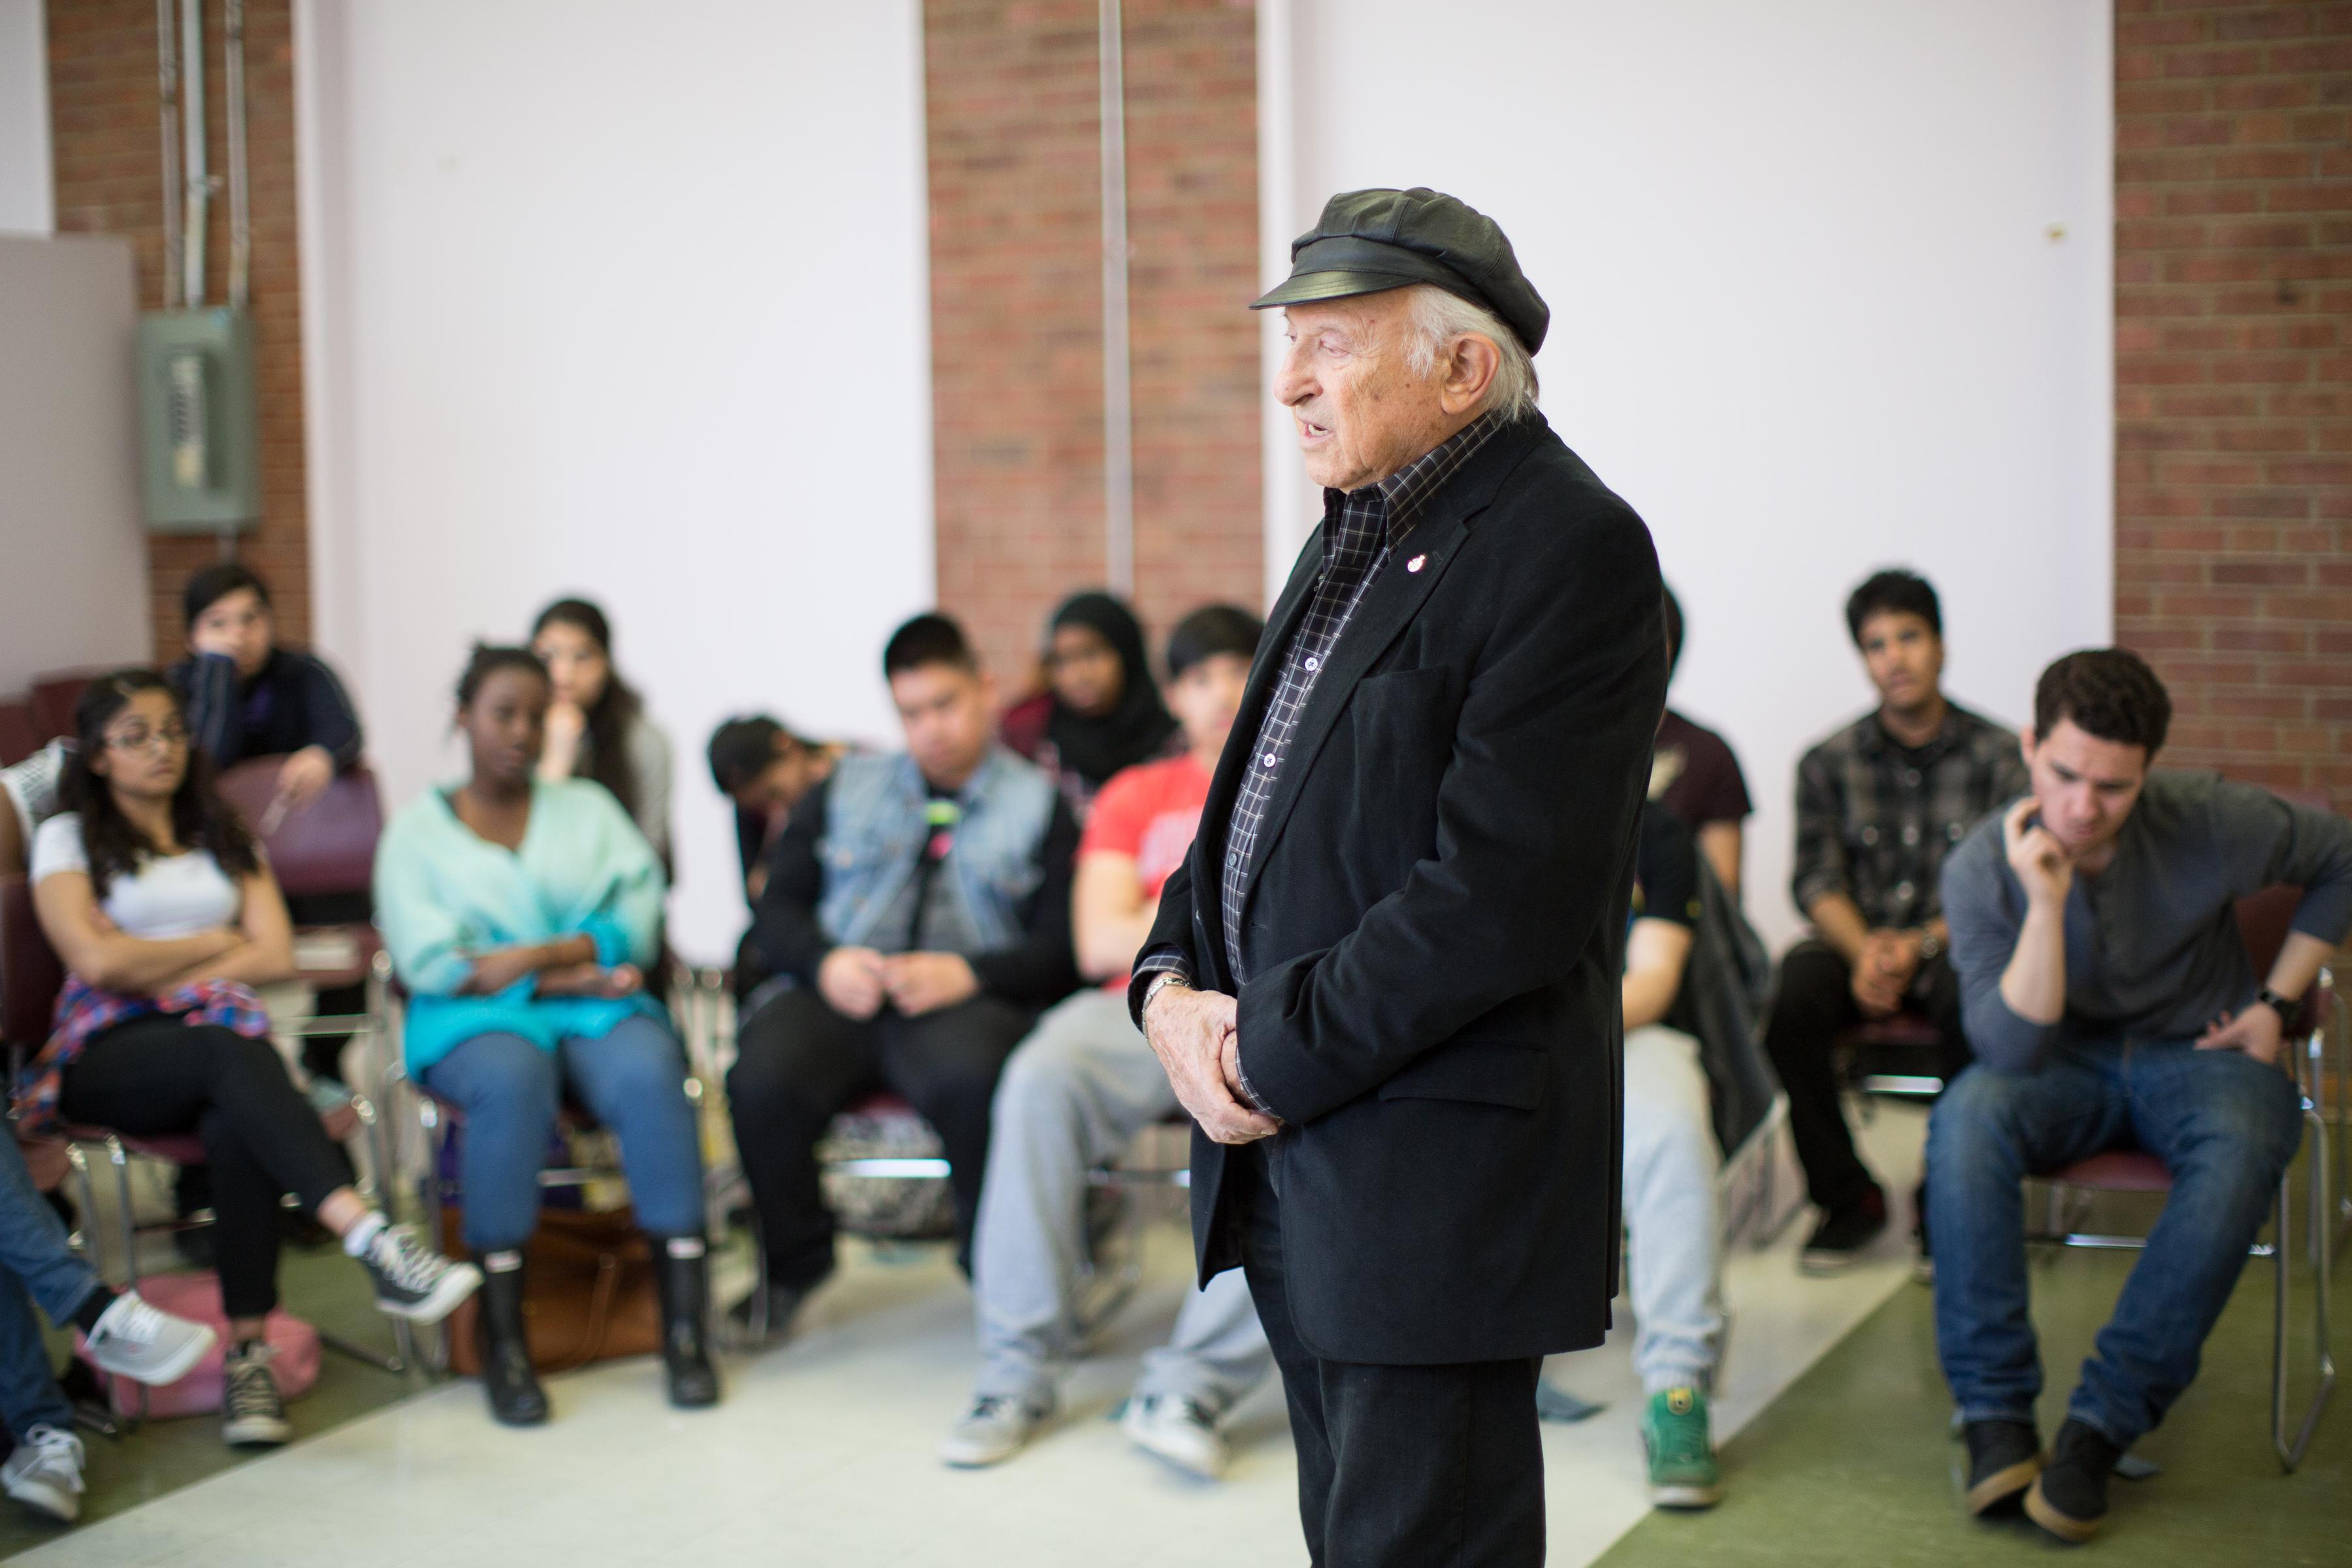 Holocaust survivor Nate Leipciger giving his testimony to students in 2014.   Photo credits: Nick Kozak